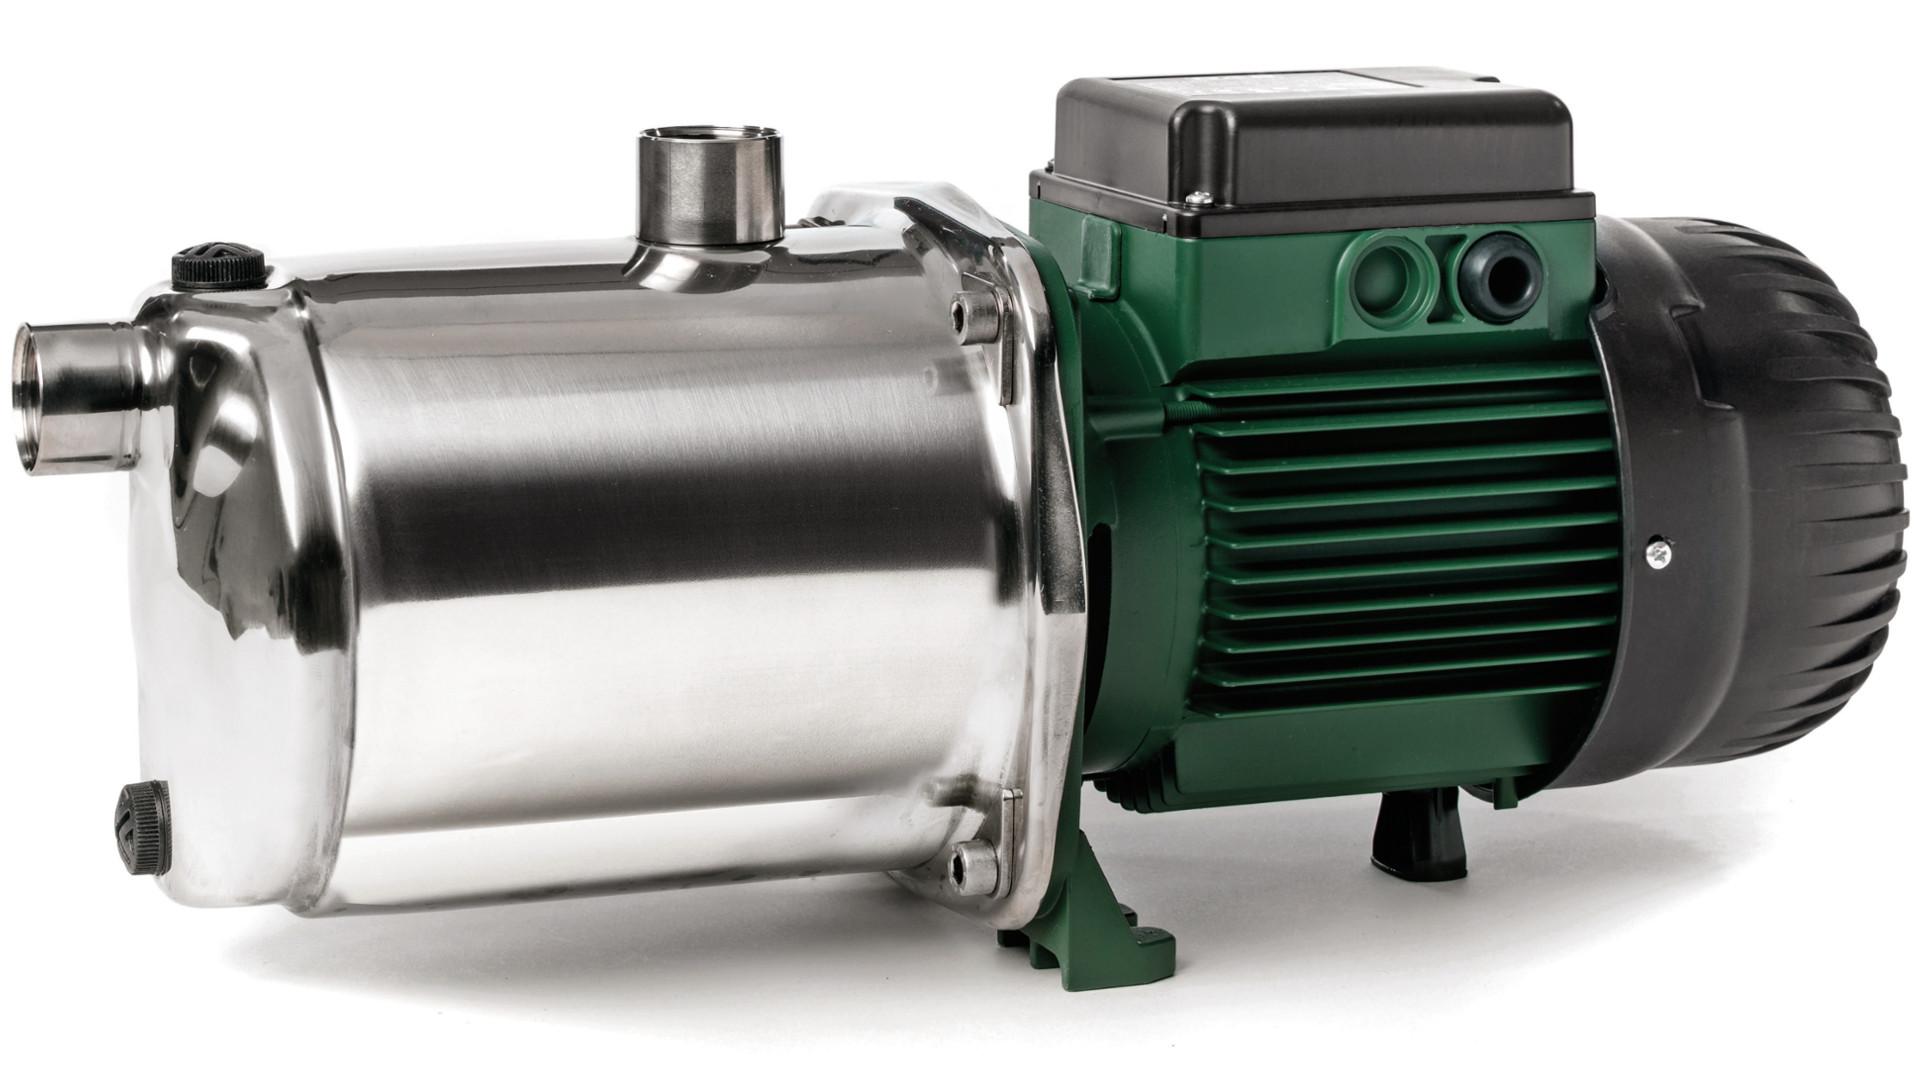 EUROINOX 30/30 M DAB Self-priming centrifugal pump 0.60 HP 230V